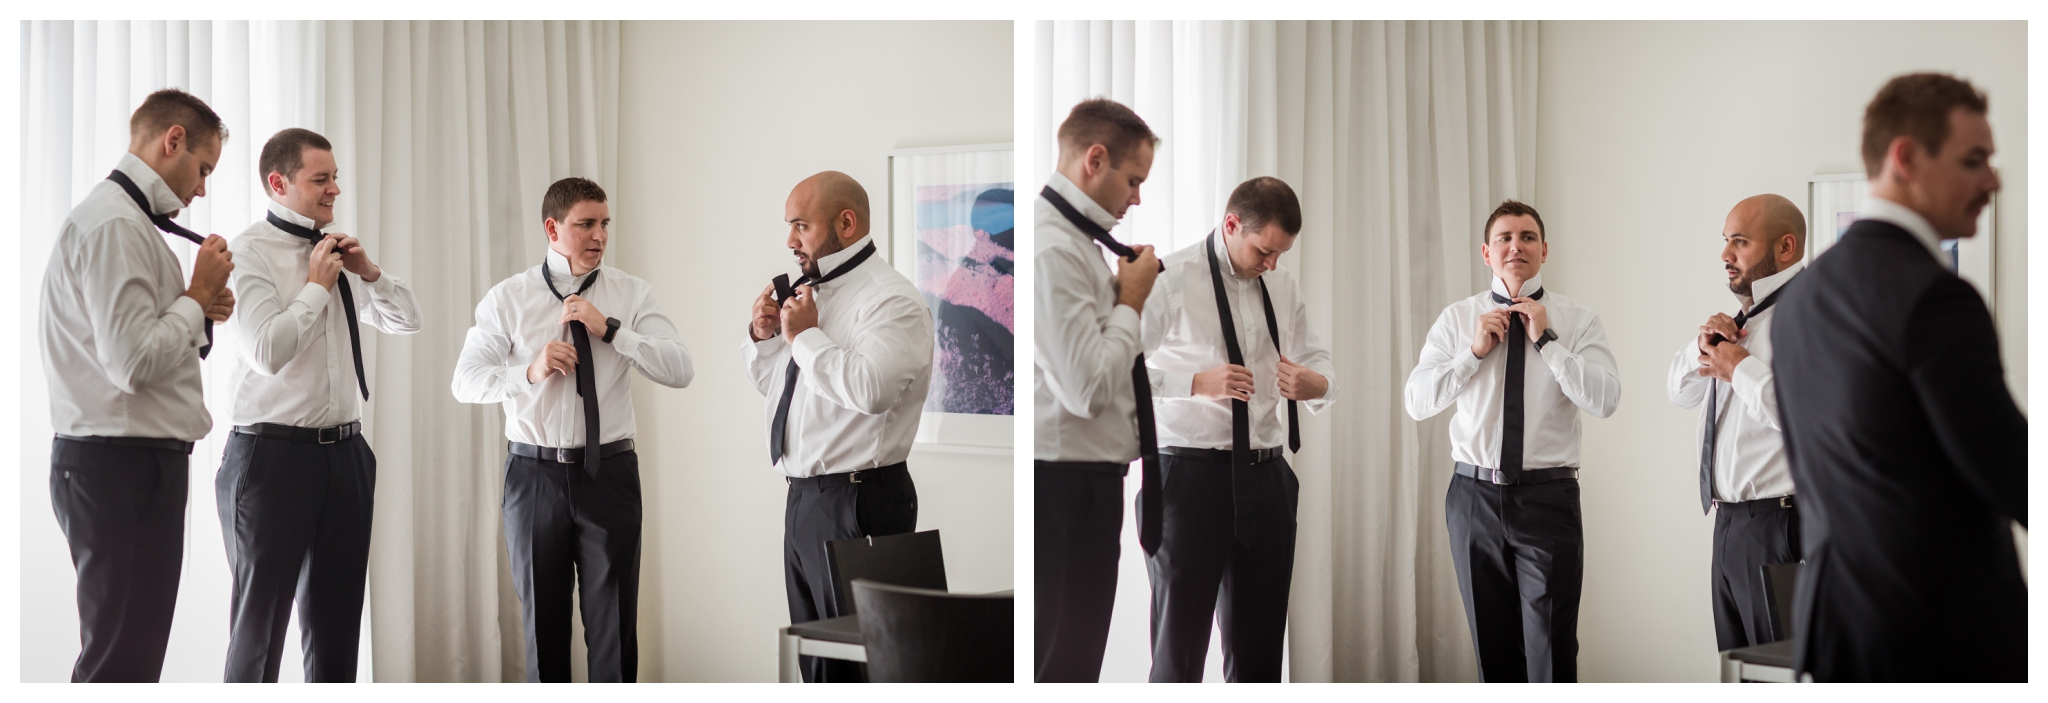 groomsmen-duxton-hotel-perth